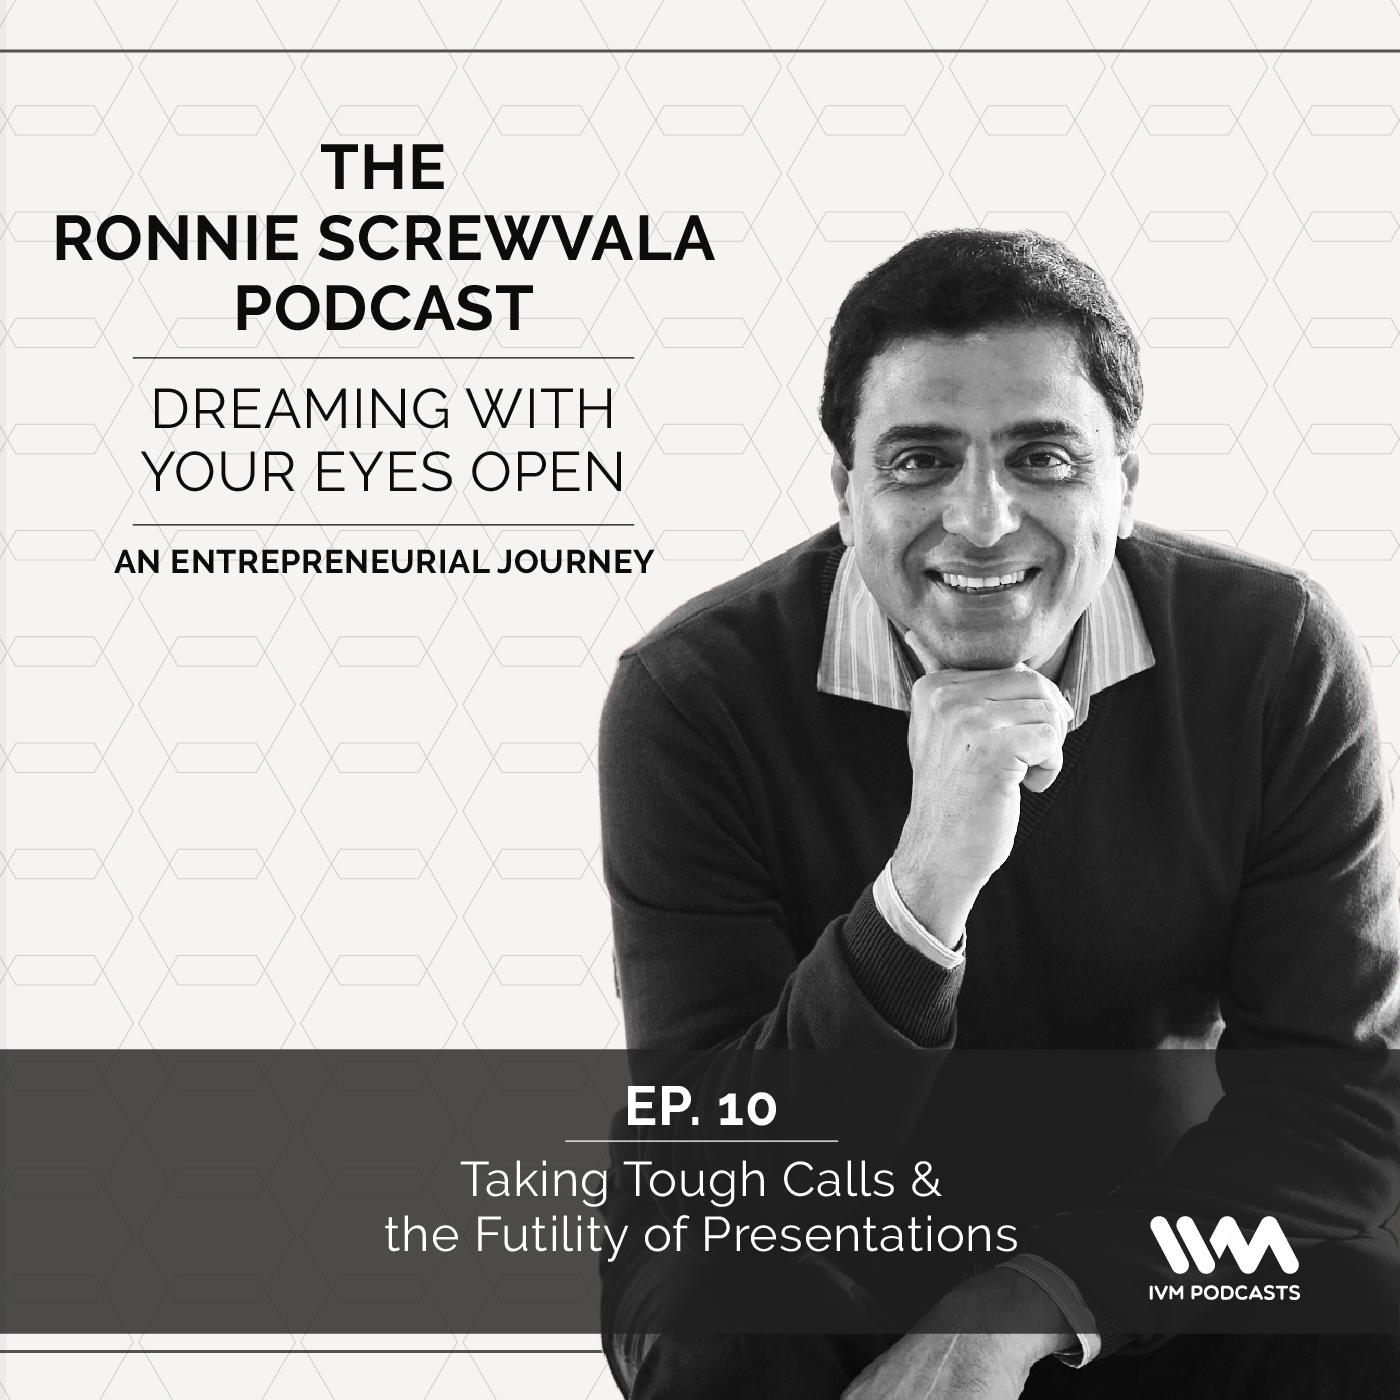 Ep. 10: Taking Tough Calls & the Futility of Presentations